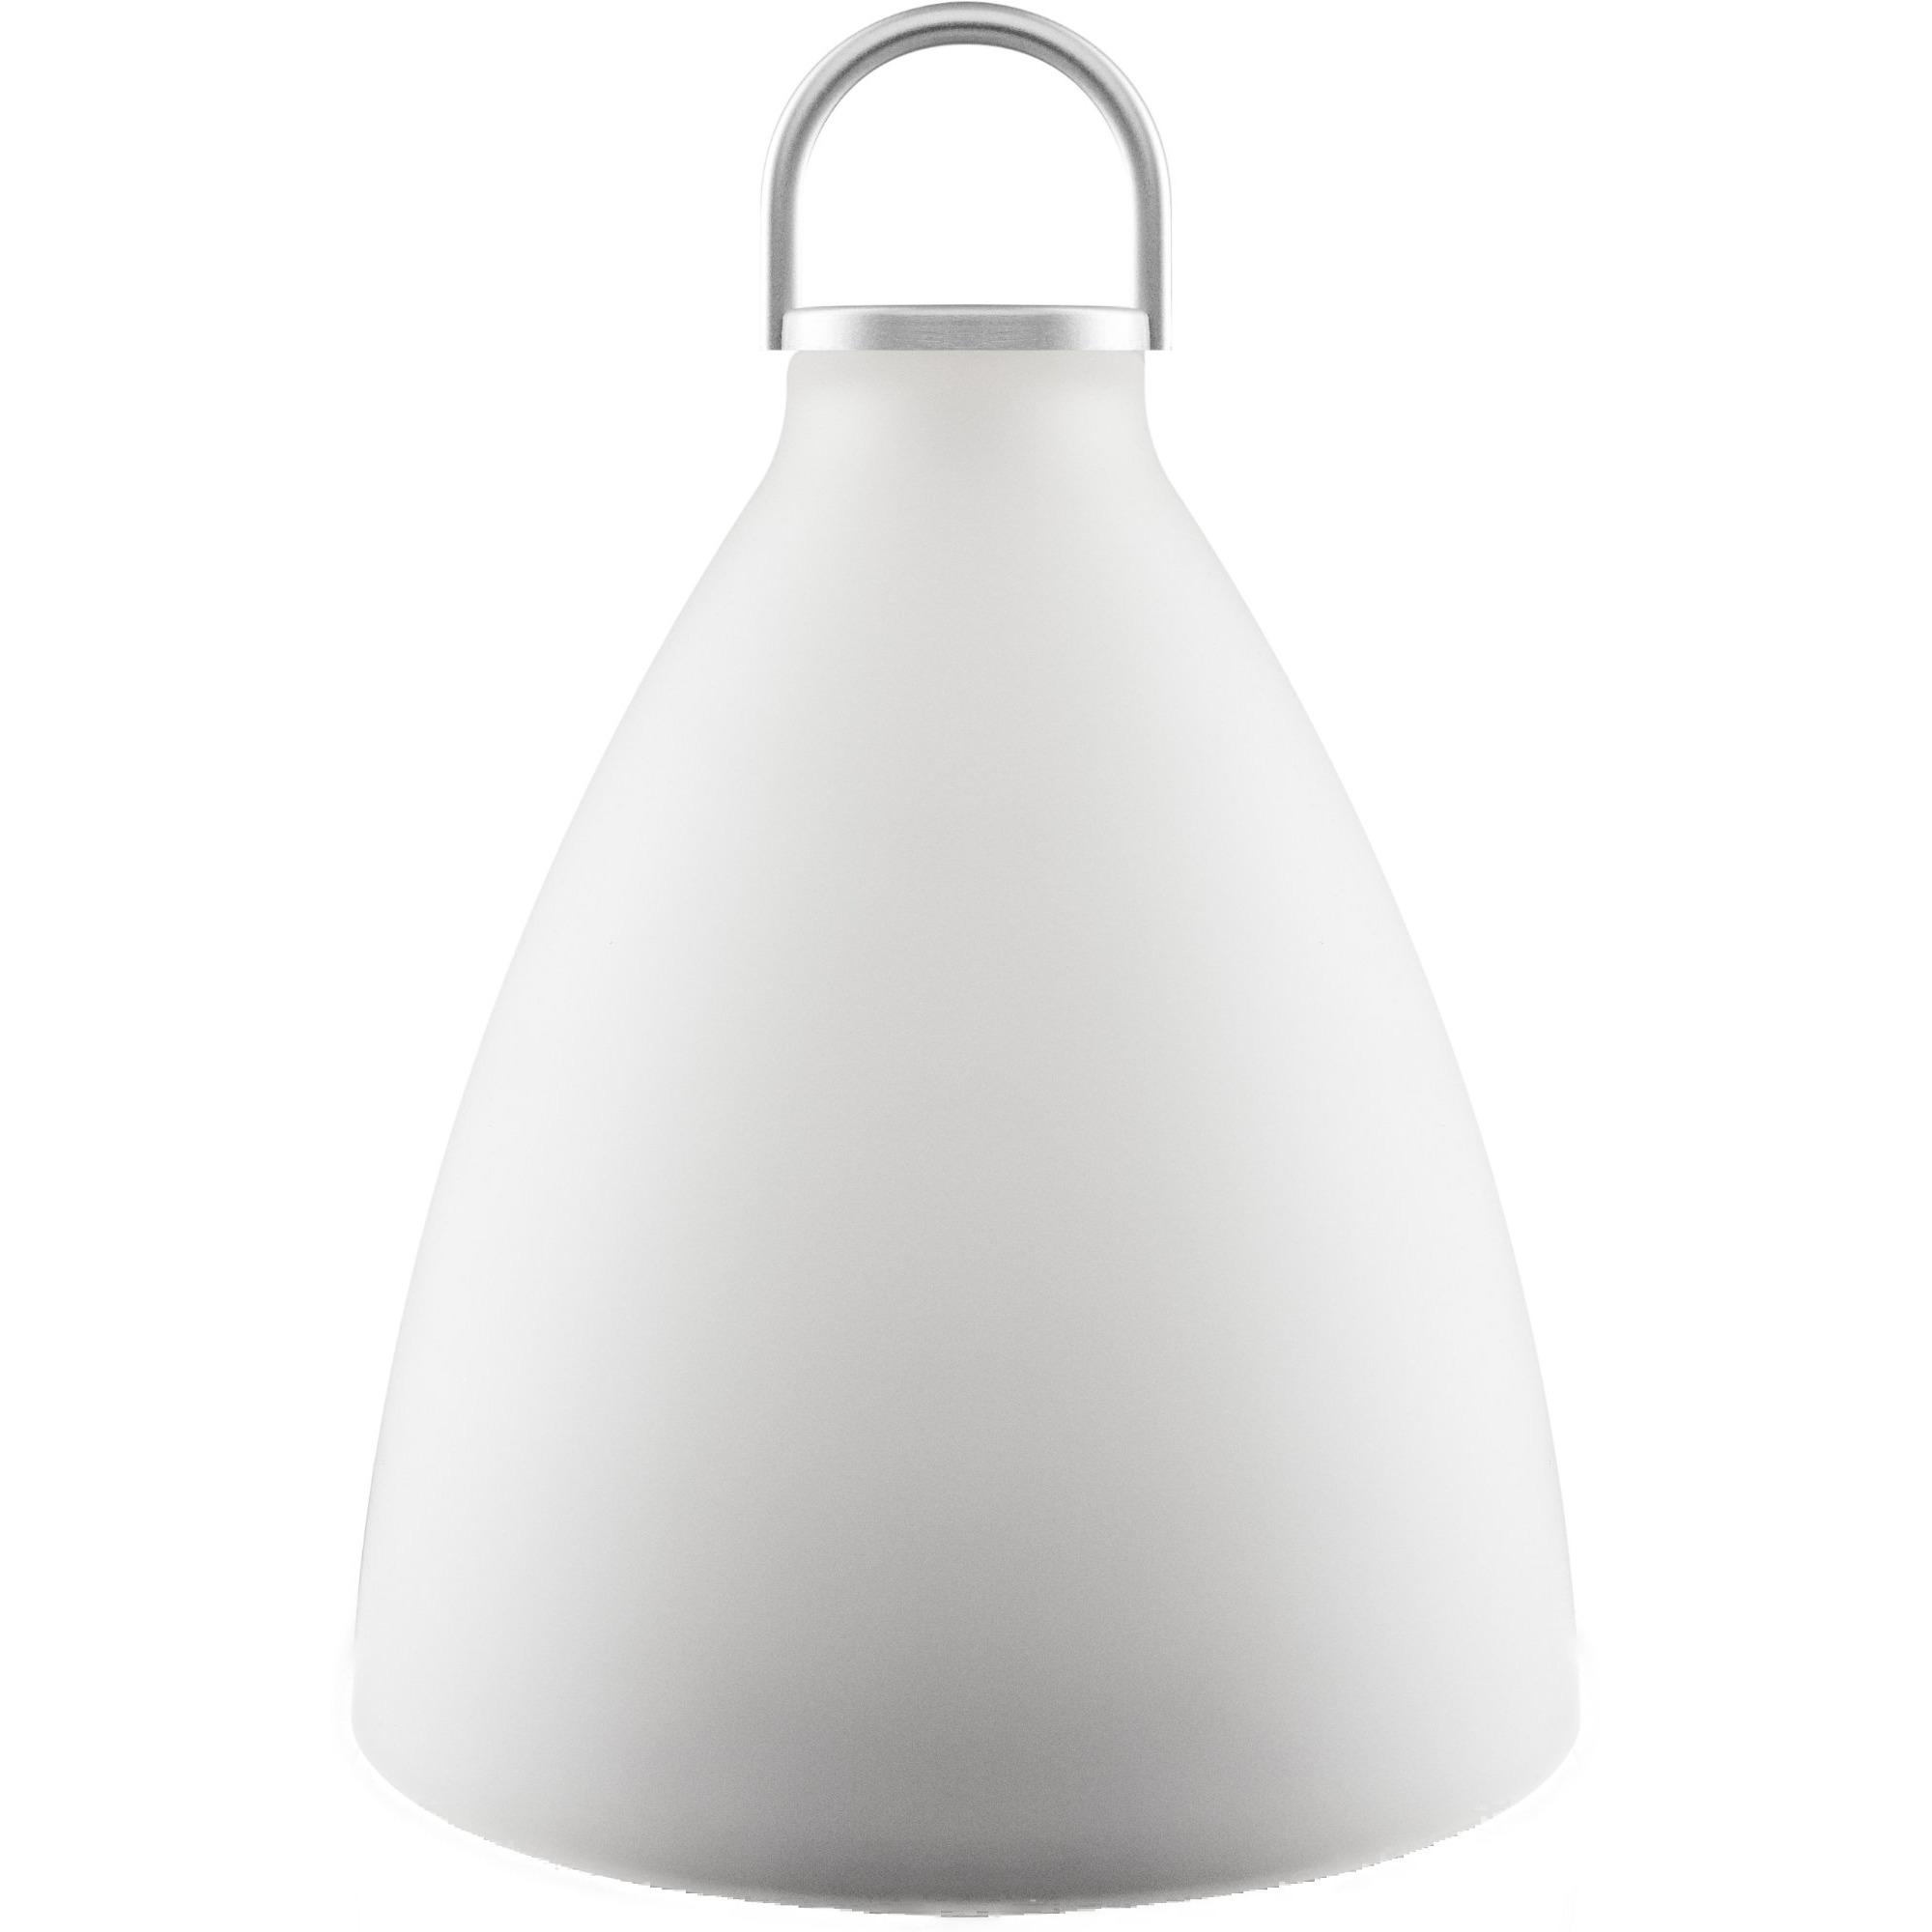 Eva Solo SunLight Lampa 20 cm